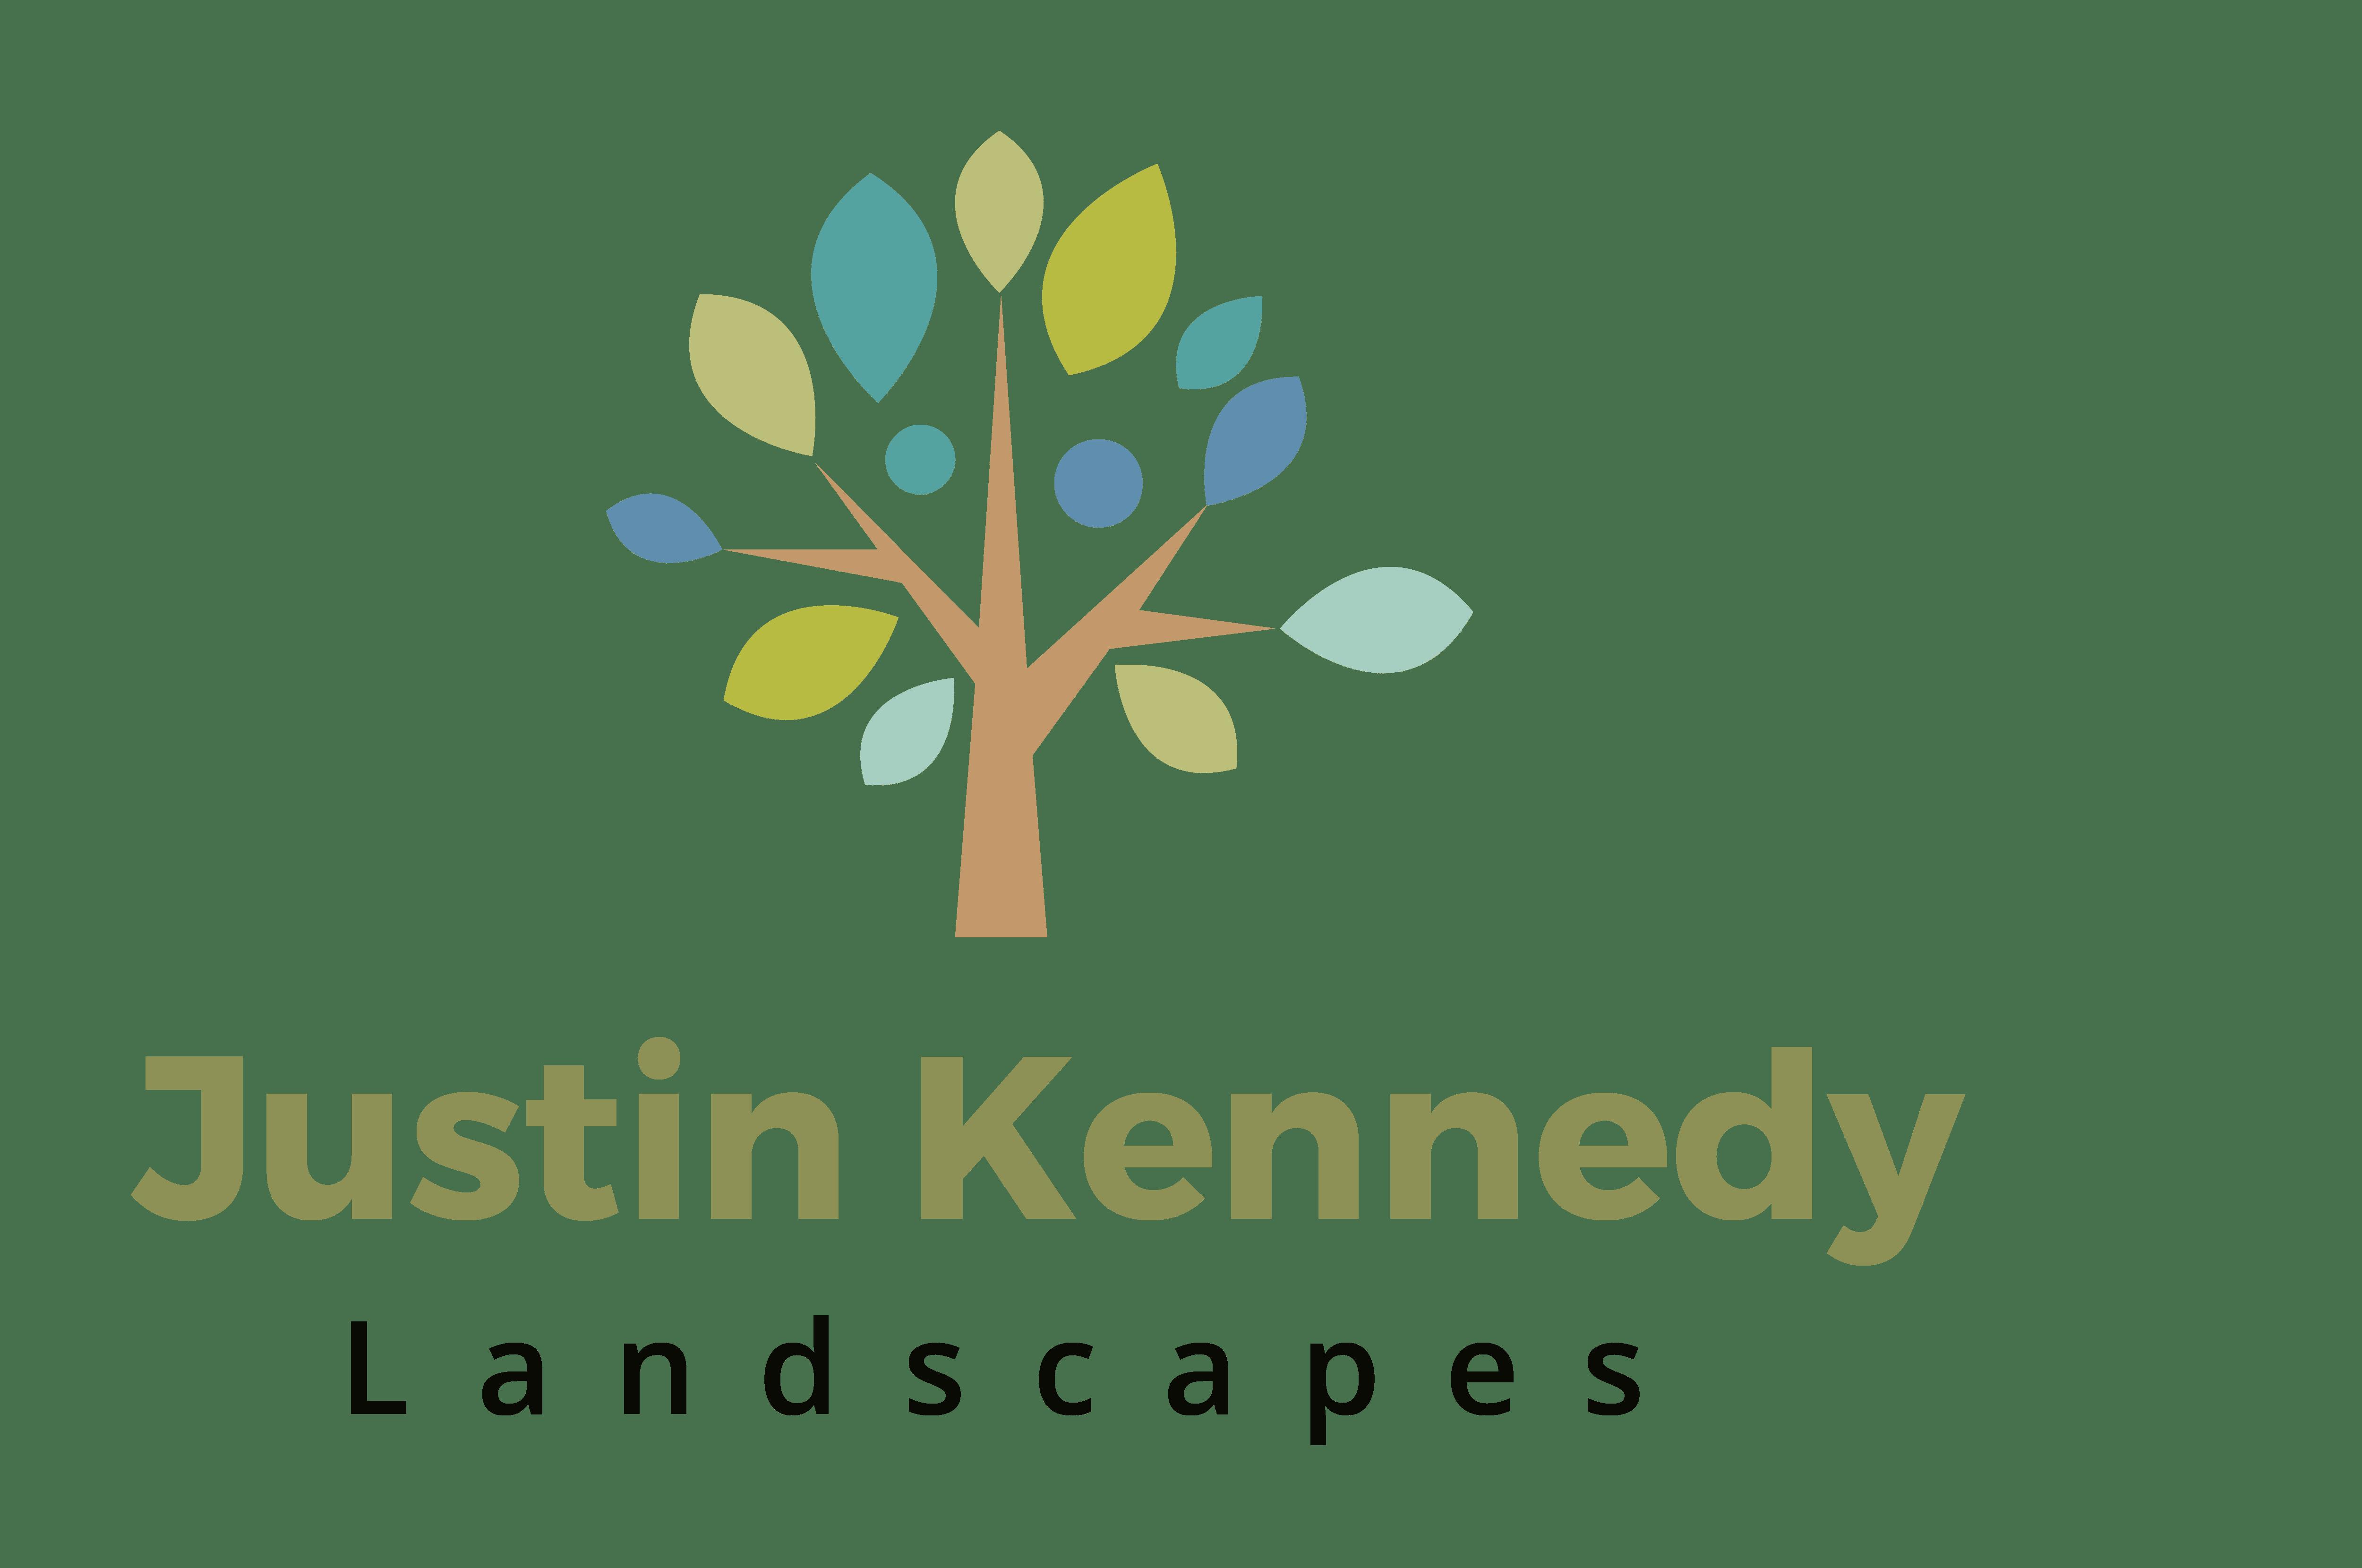 Justin Kennedy Landscapes